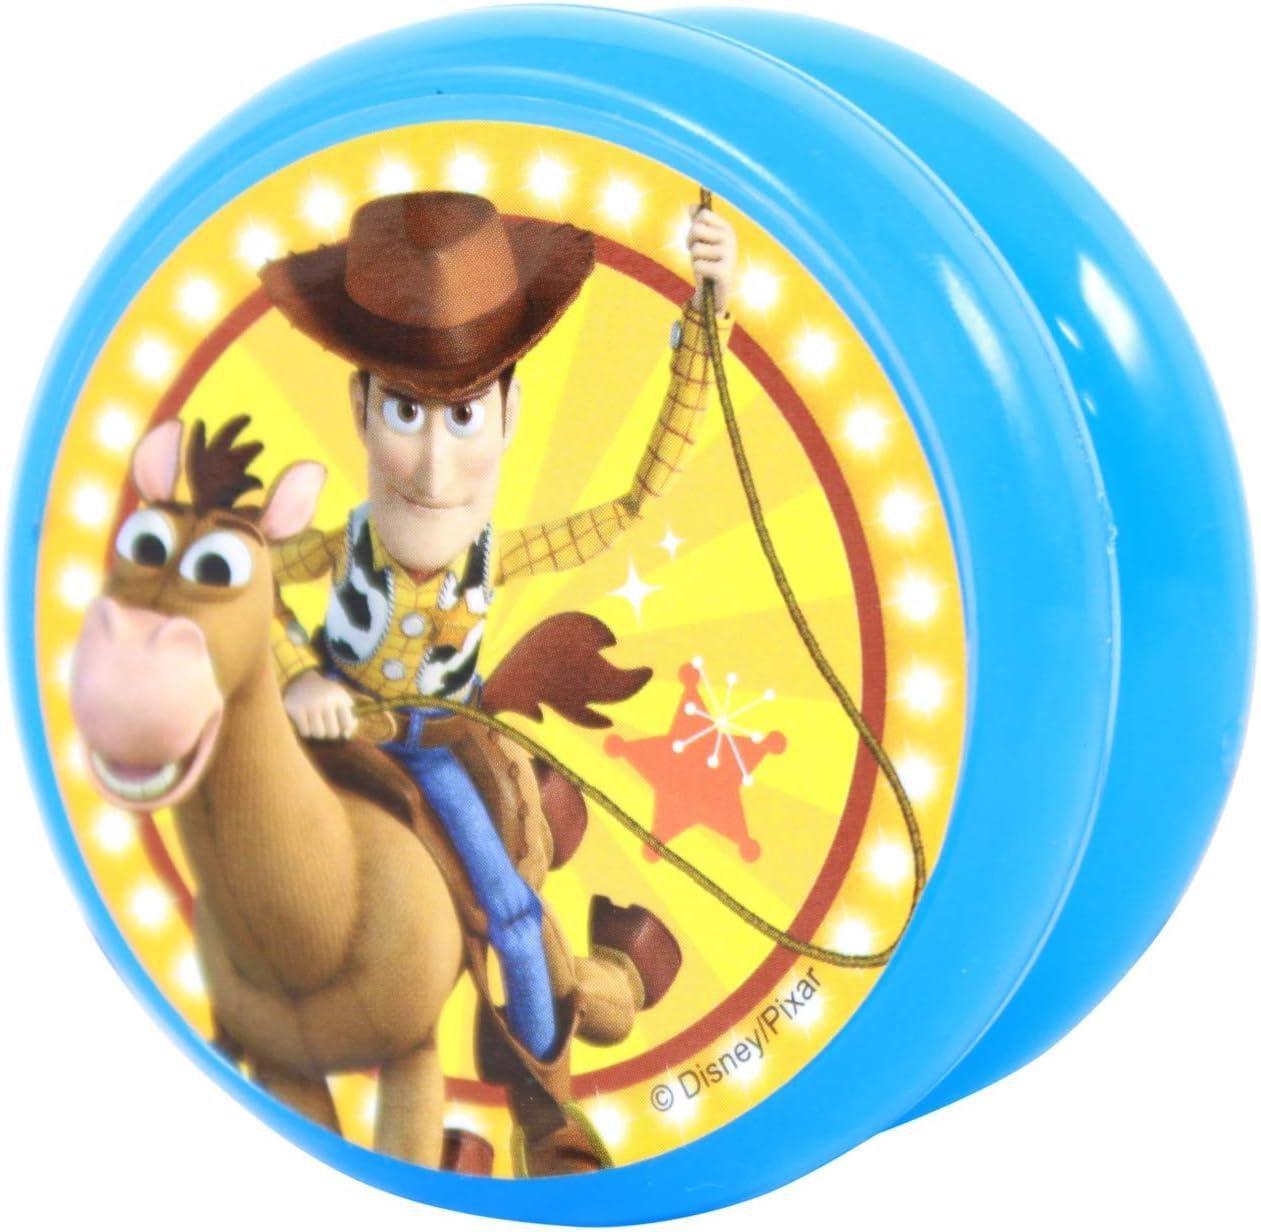 Marvel Spiderman Homecoming Kids Classic Toy Yo-Yo LED Lights Up Blue Gift